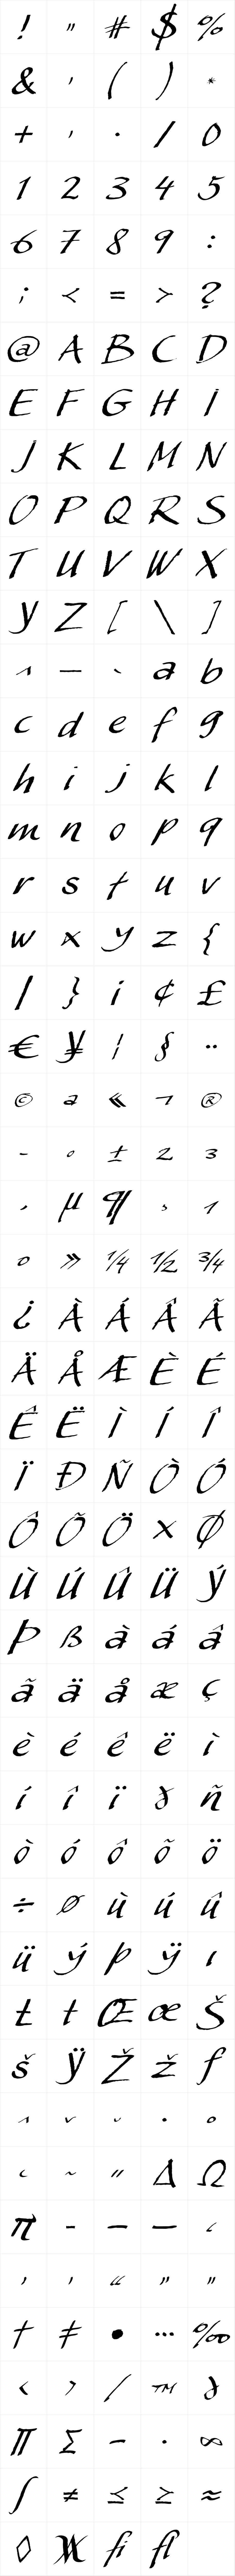 My Script Plain